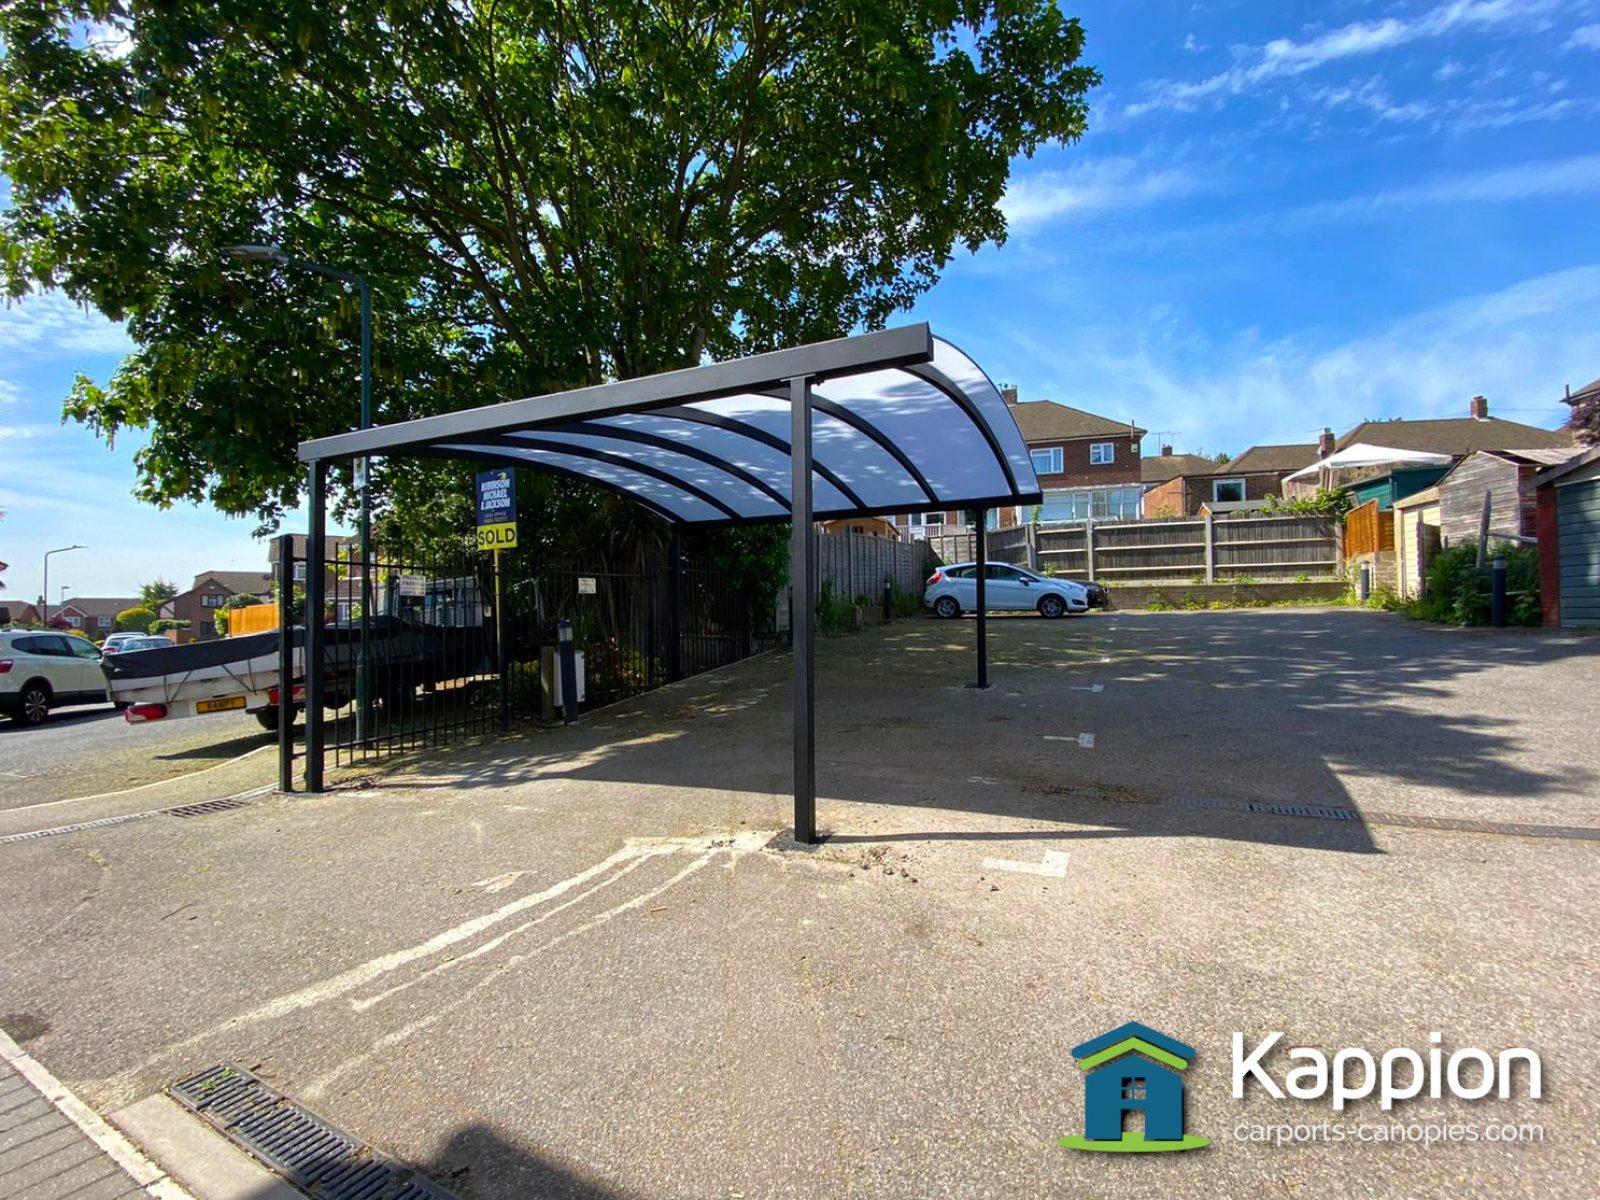 carport-rochester-002